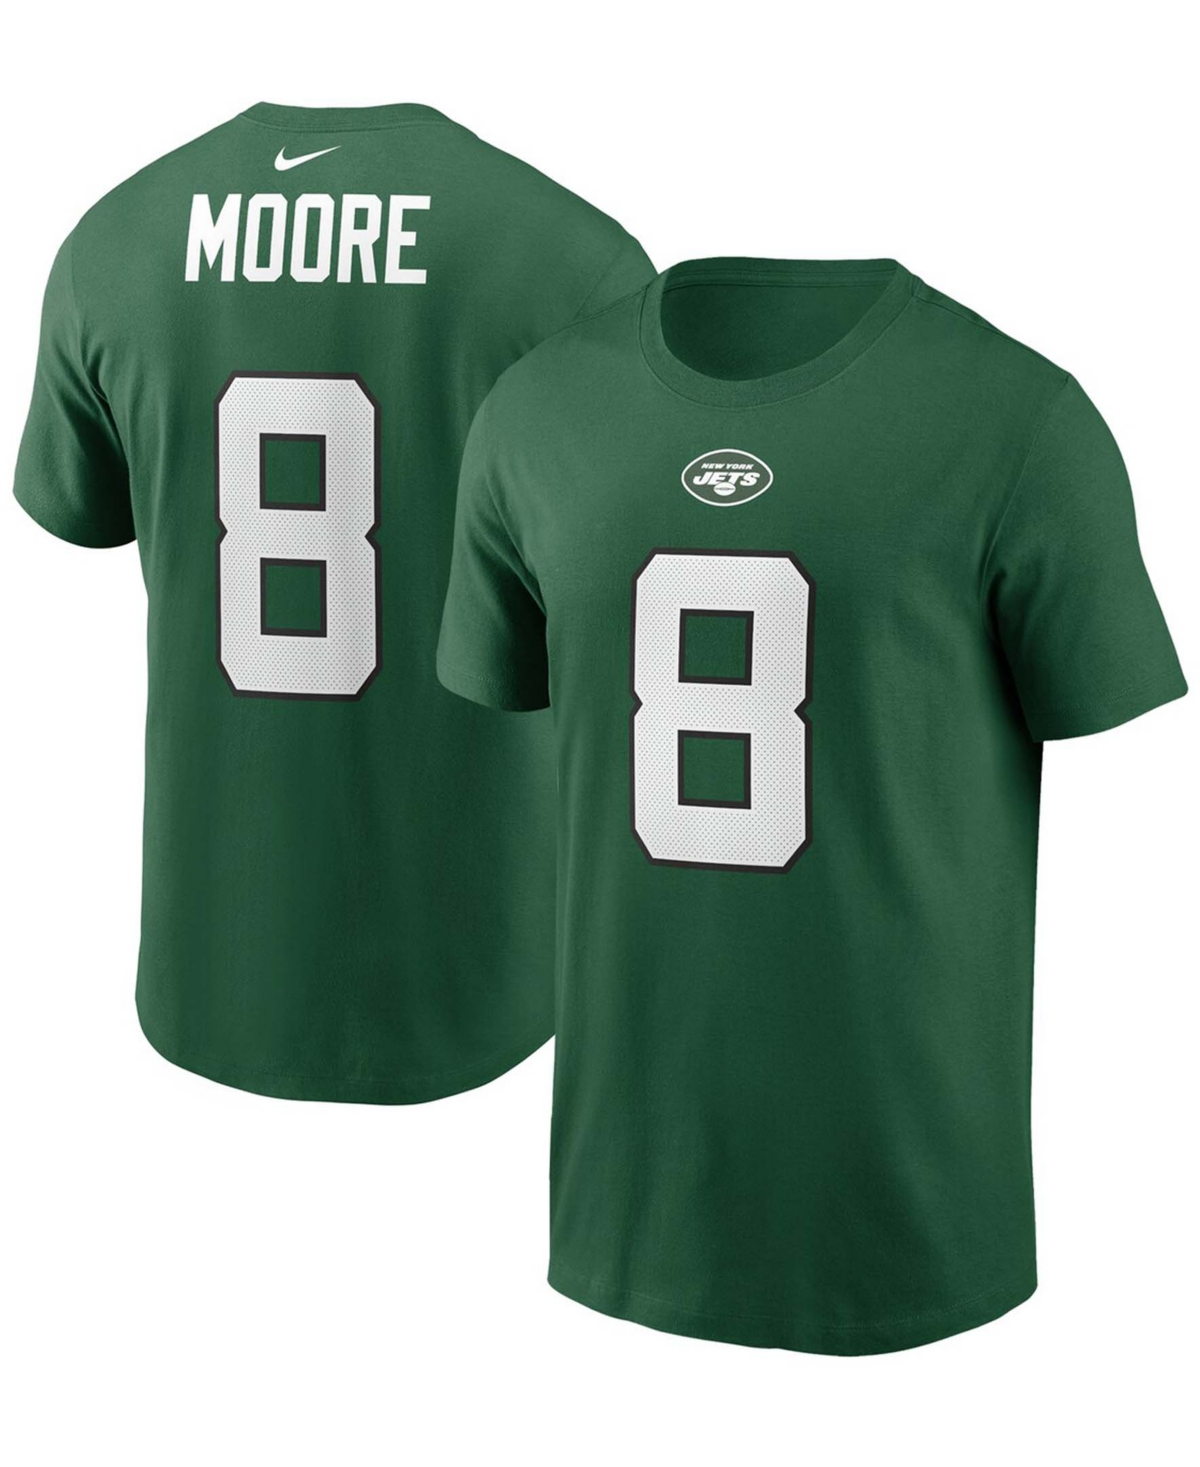 Men's Elijah Moore Green New York Jets 2021 Nfl Draft Pick Player Name Number T-shirt